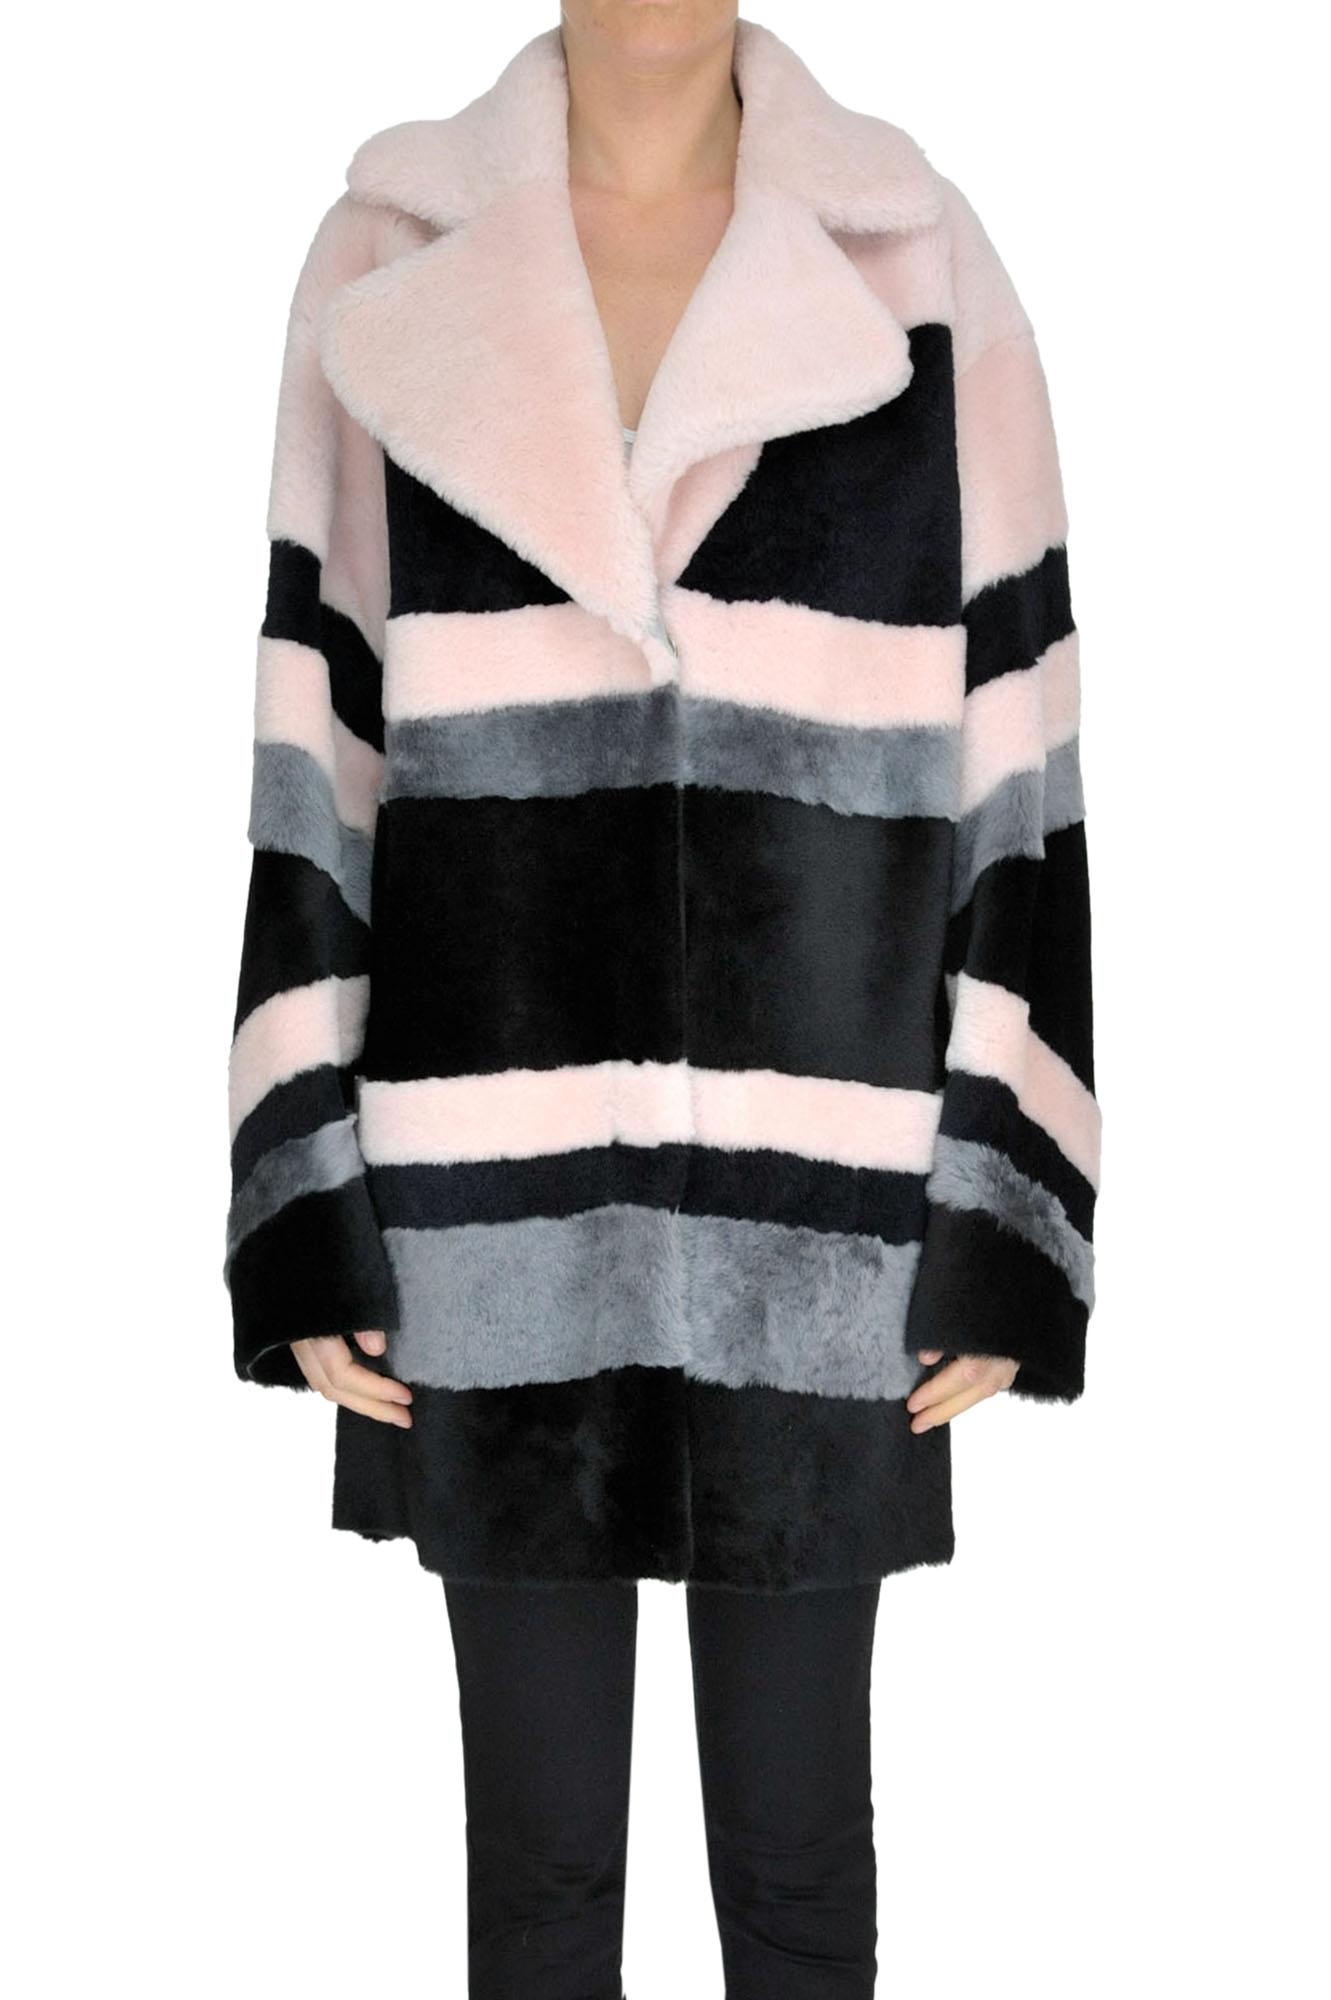 B&W Striped Reversible Shearling in Multicoloured